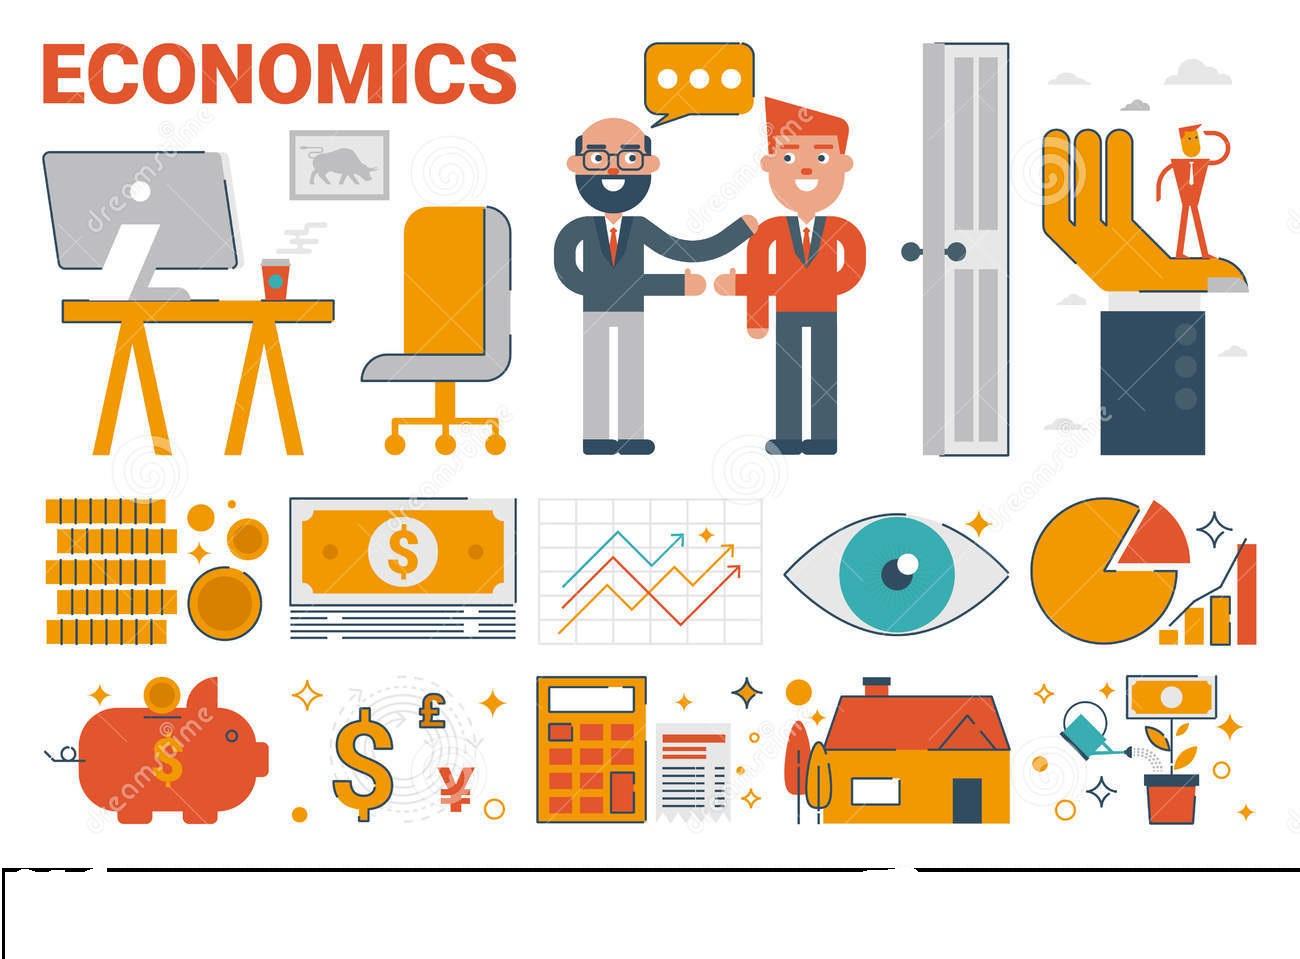 Gauhati University Question Papers Economic Major - Assam Study